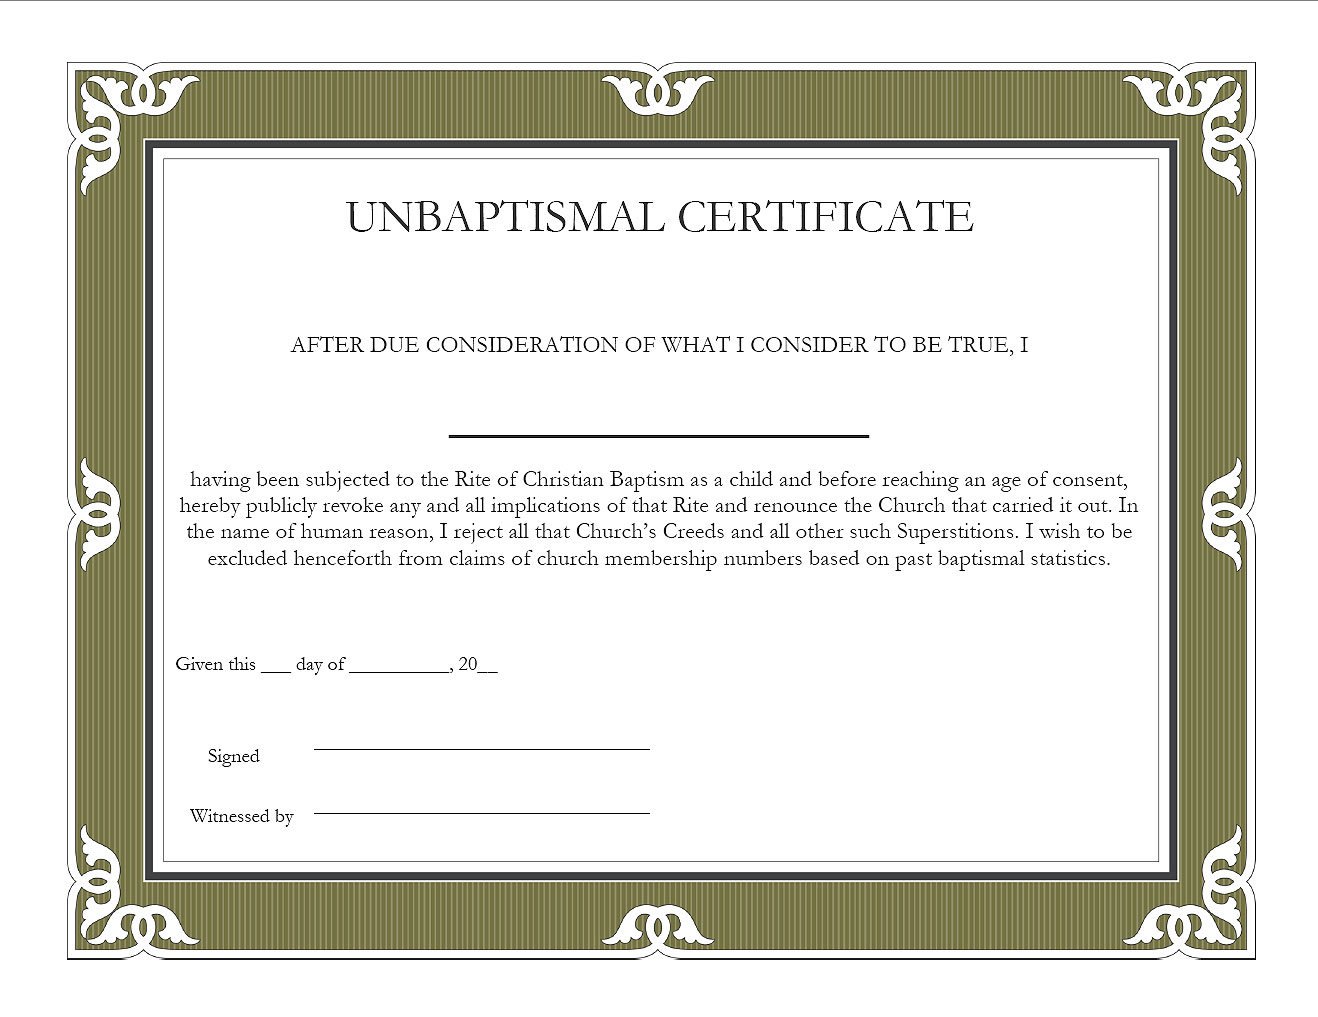 Unbaptism pdf format altavistaventures Gallery